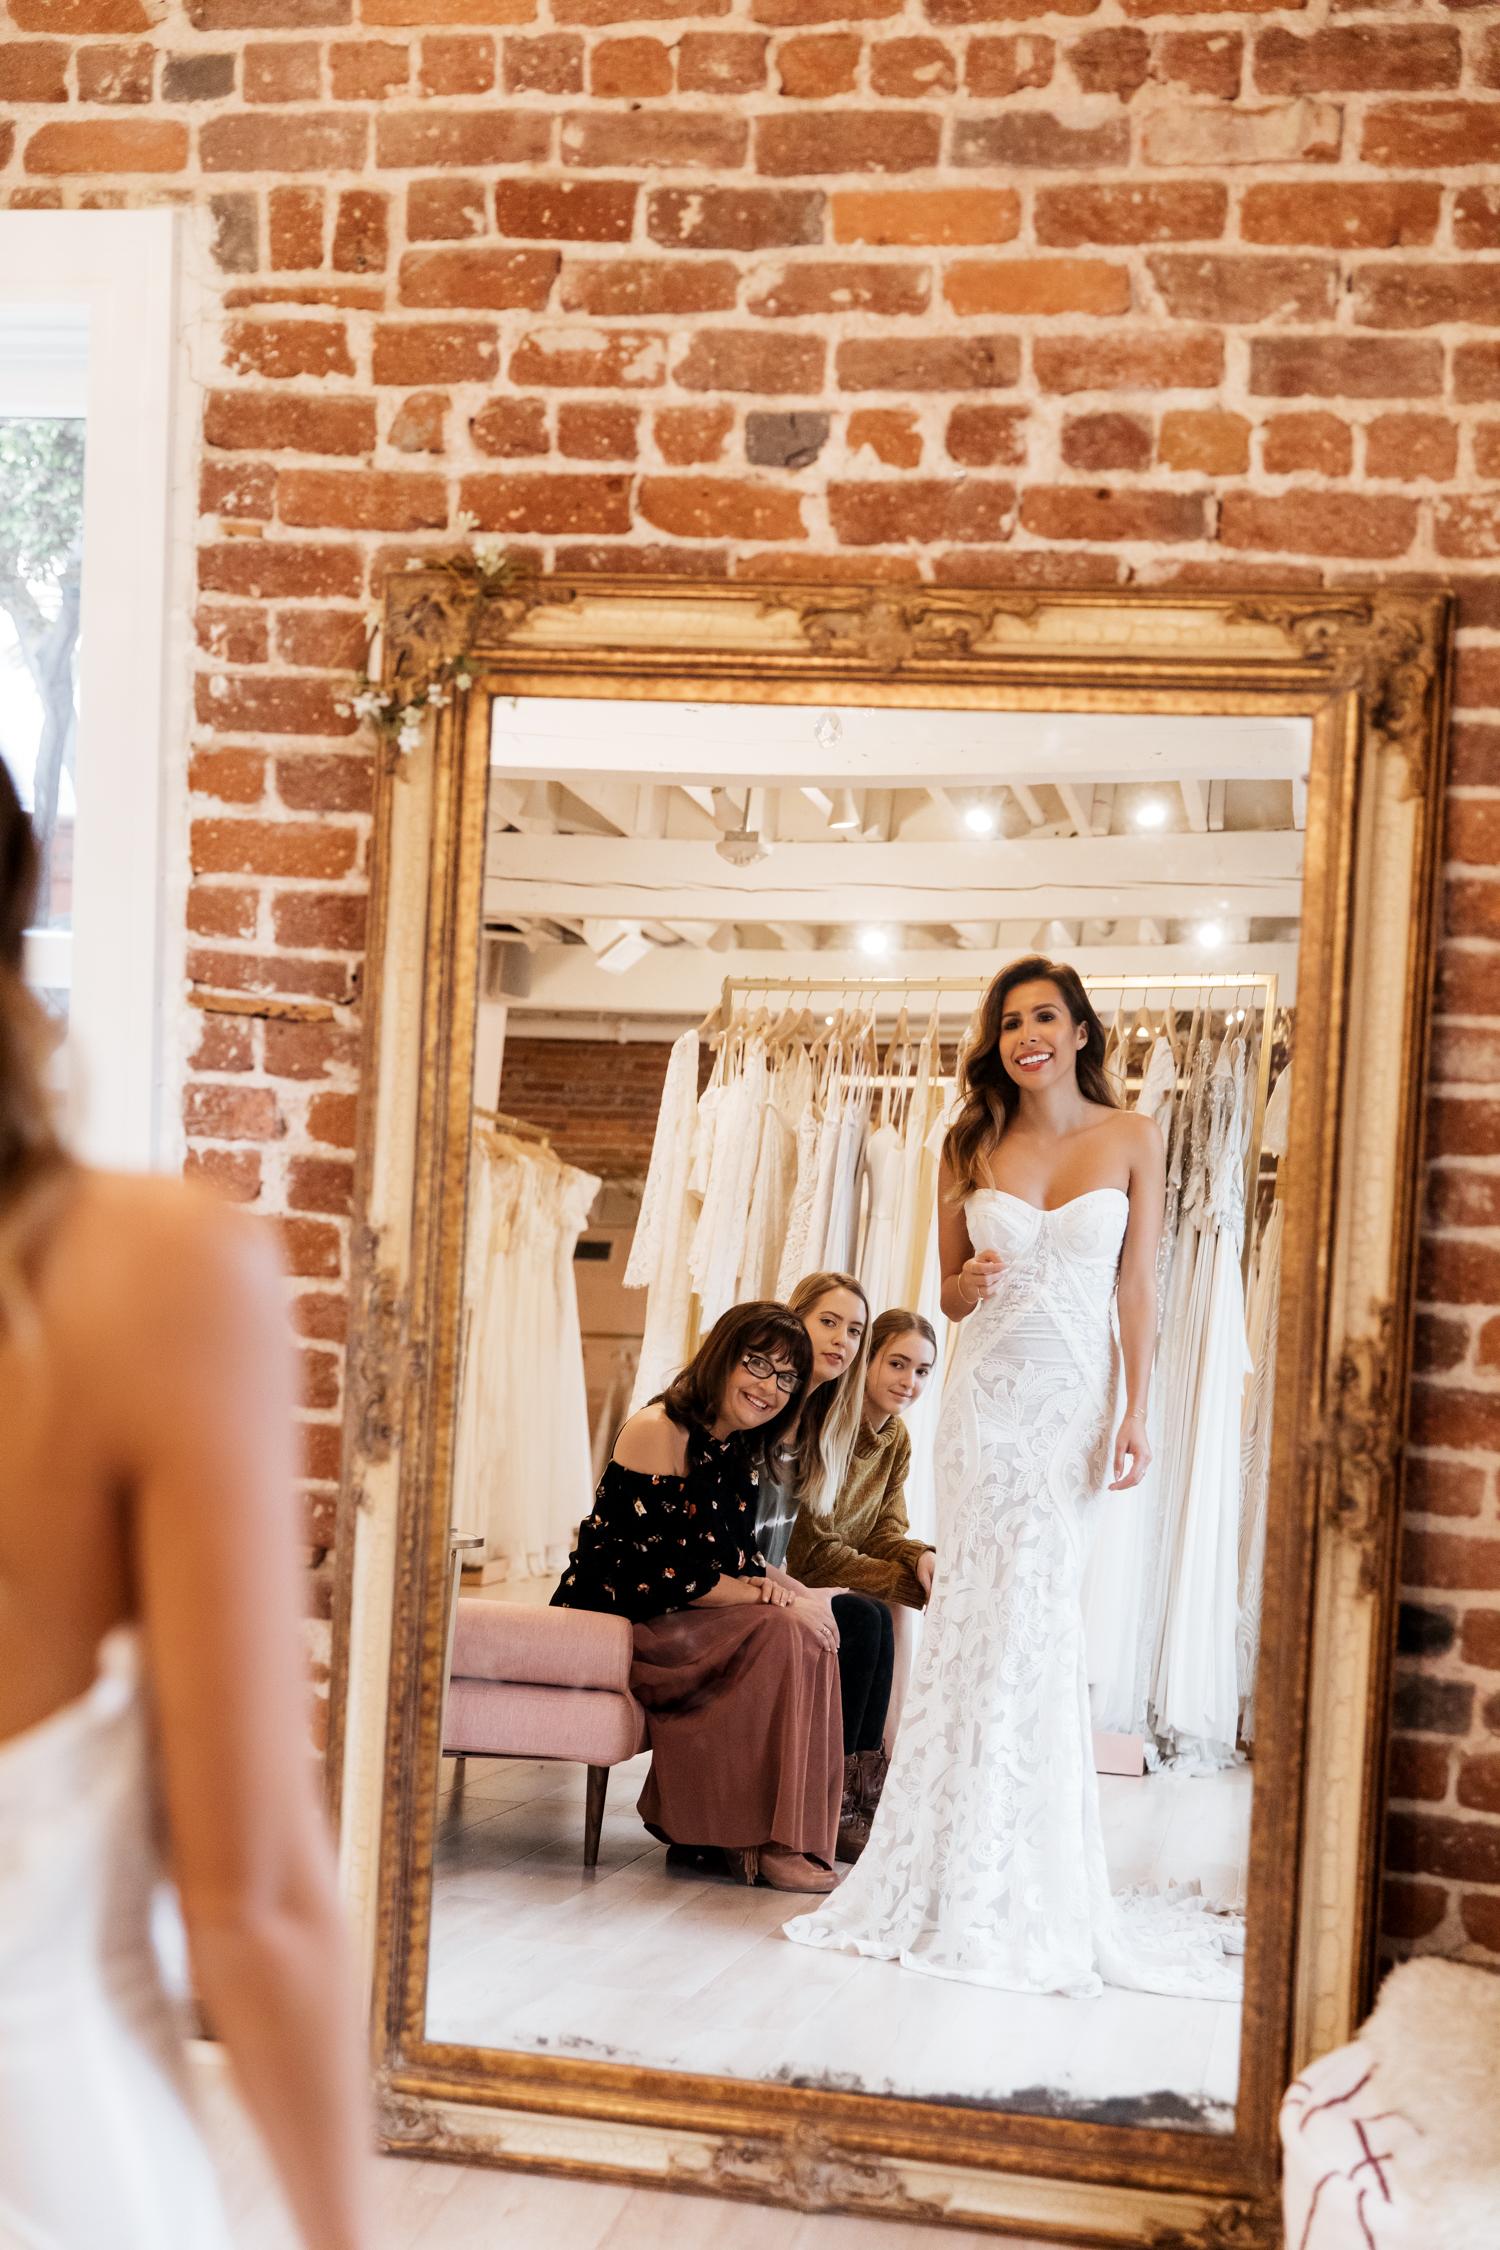 Rue De Seine Wedding Dress at Lovely Bride Los Angeles - Everyday Pursuits